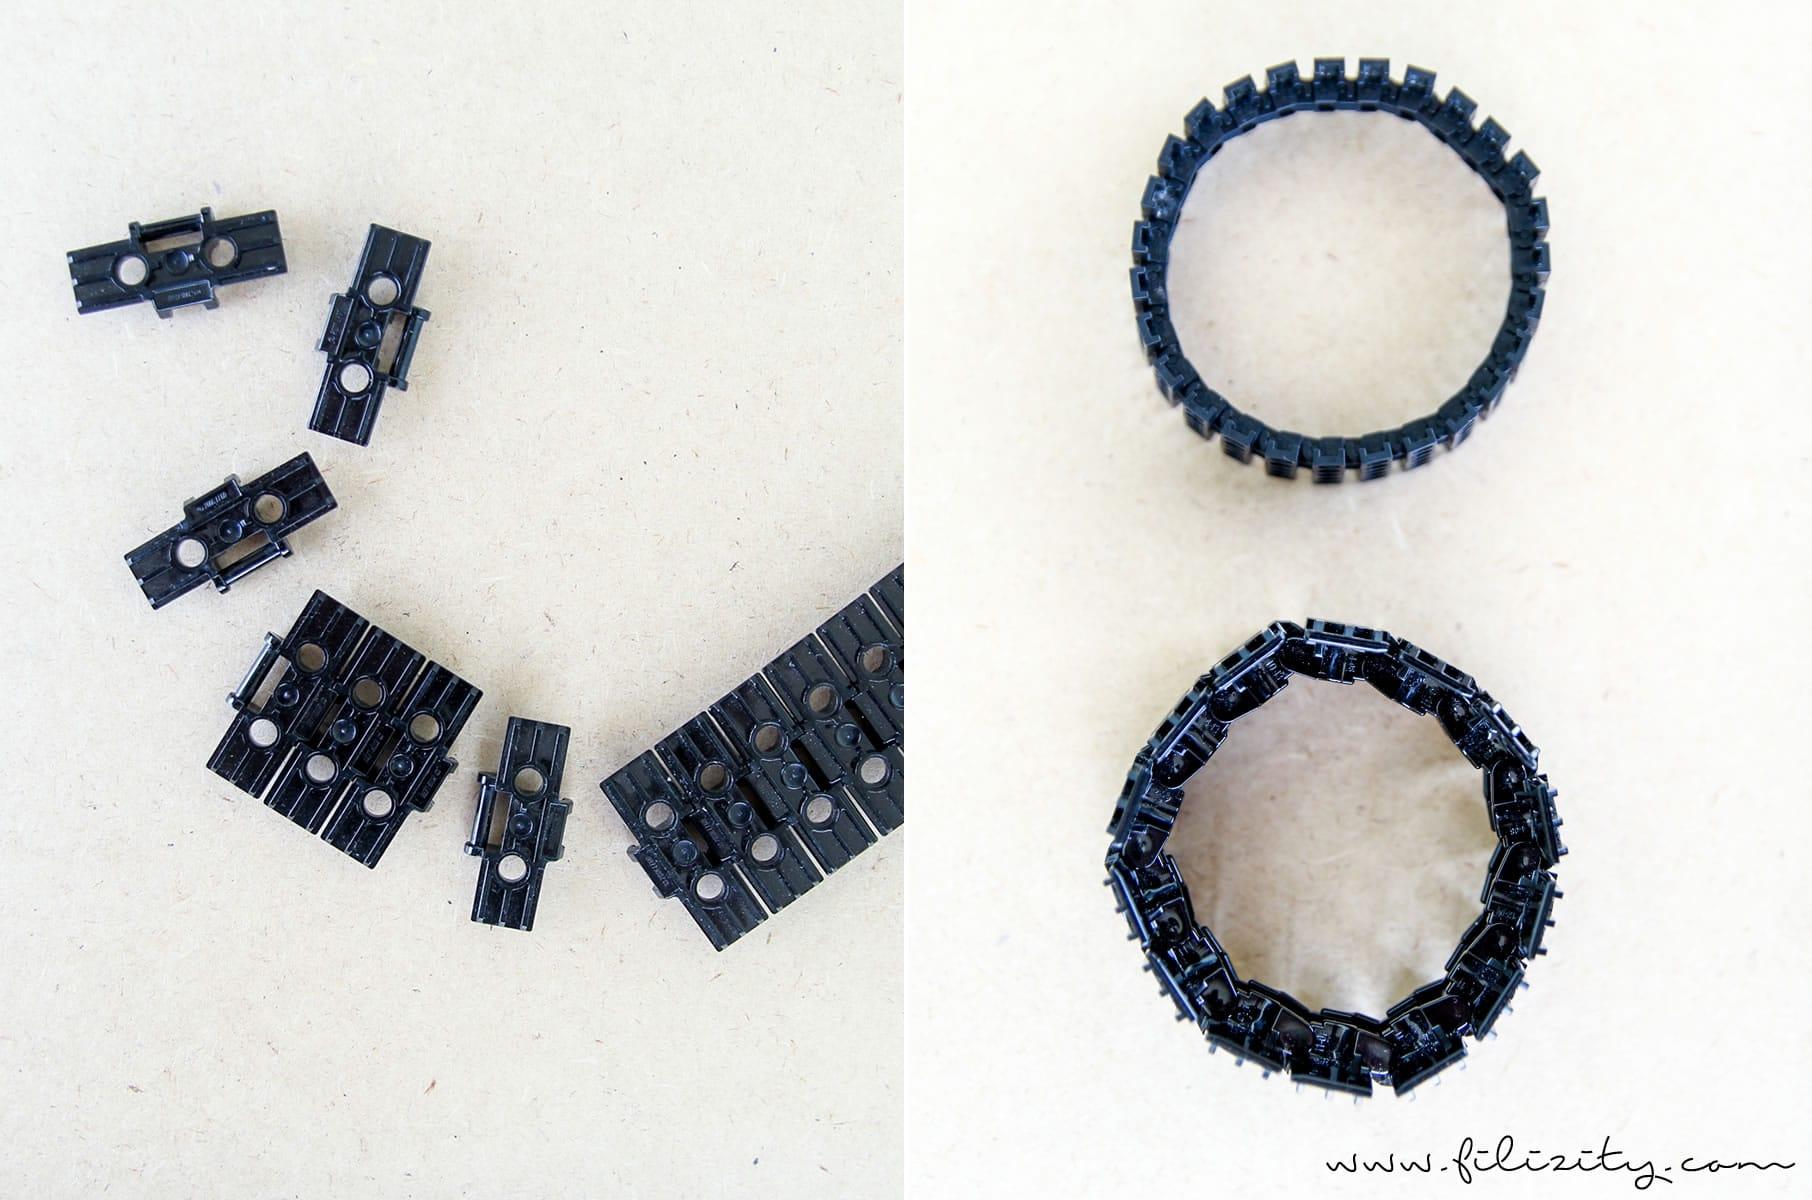 DIY Schmuck: Eleganter Armreif aus Lego-Panzerkette - Anleitung